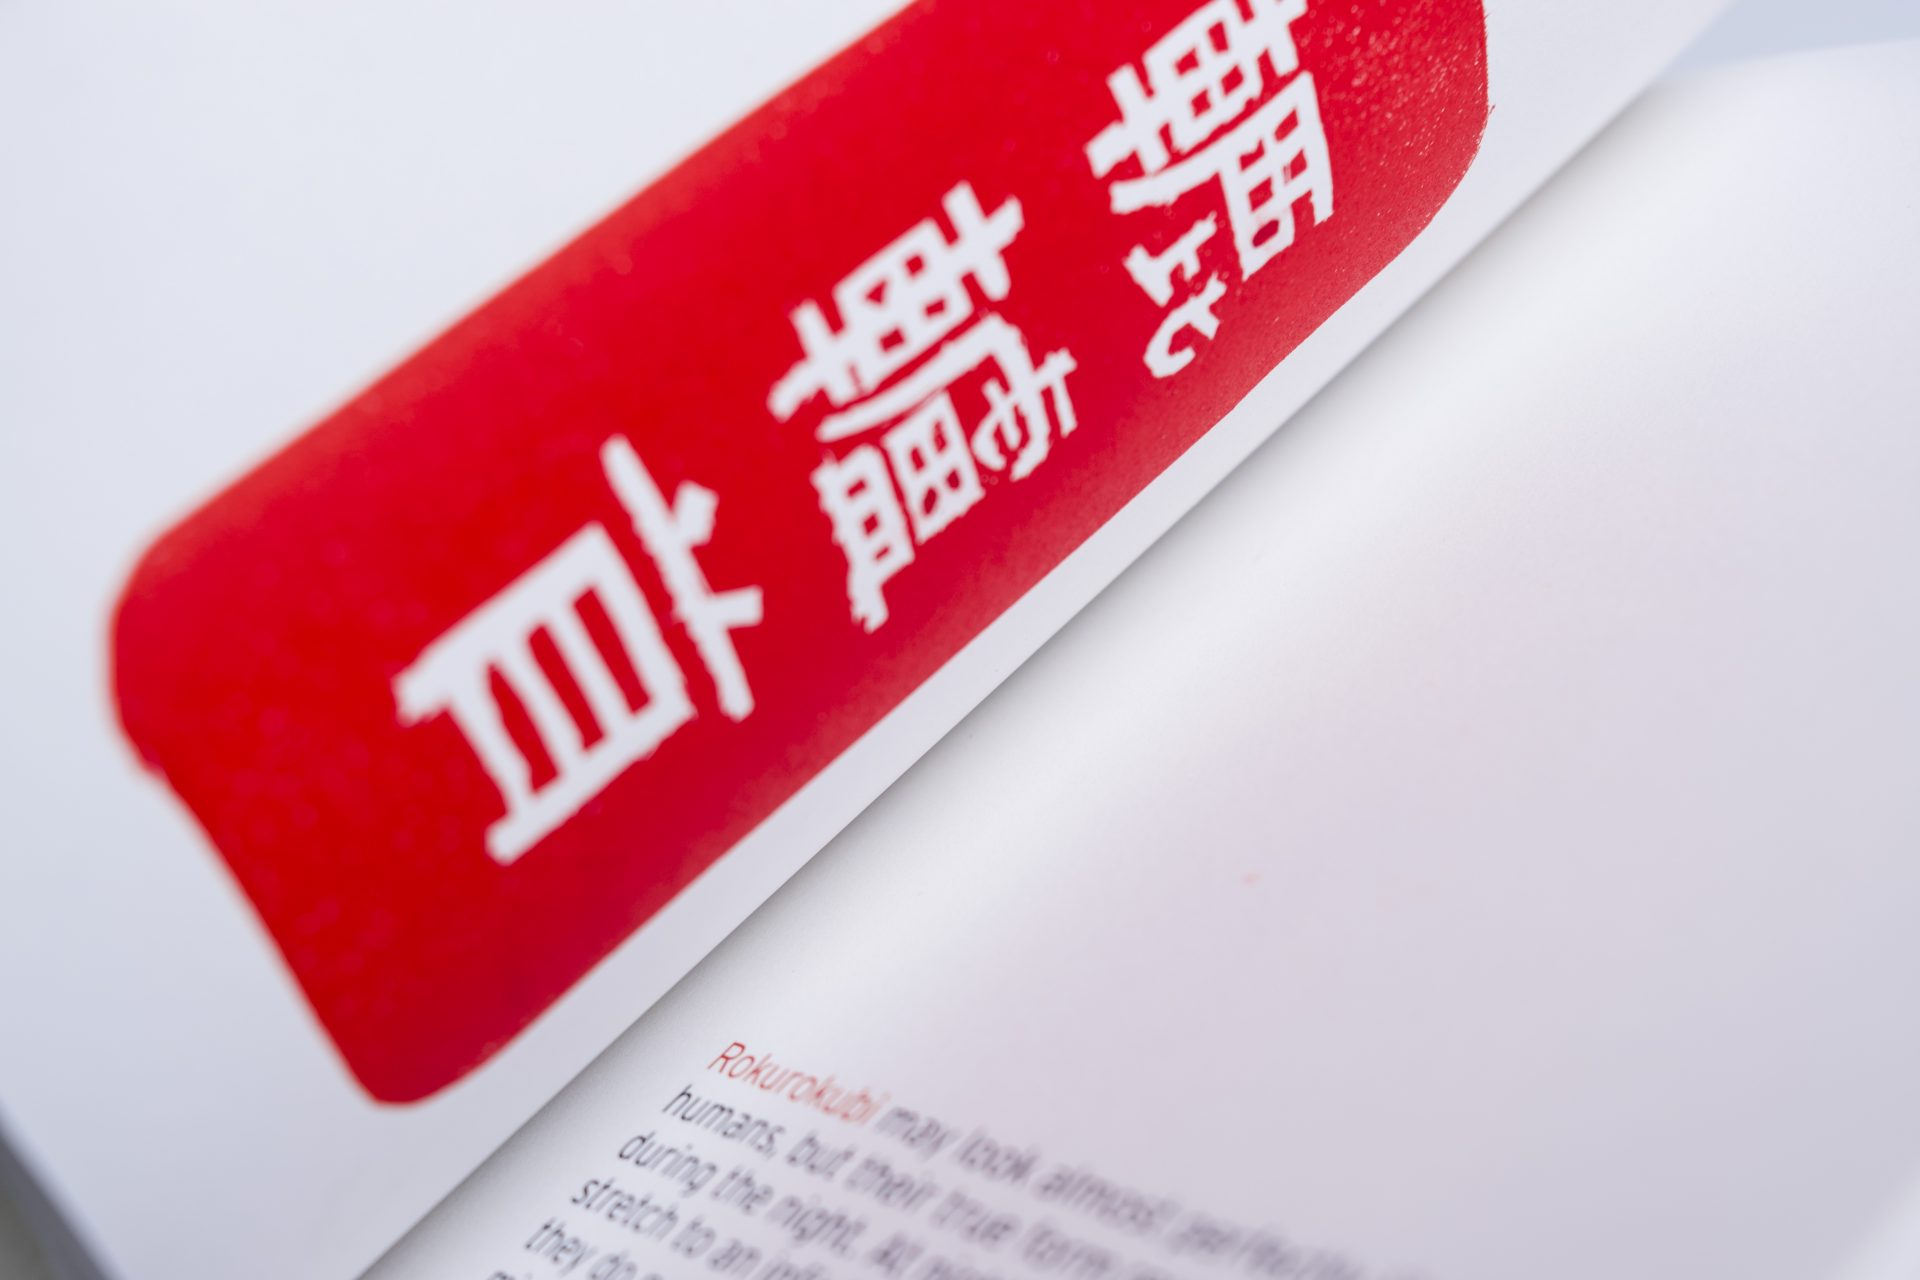 Design Project »Imagine Japan«, BookDesign, OktaySönmez